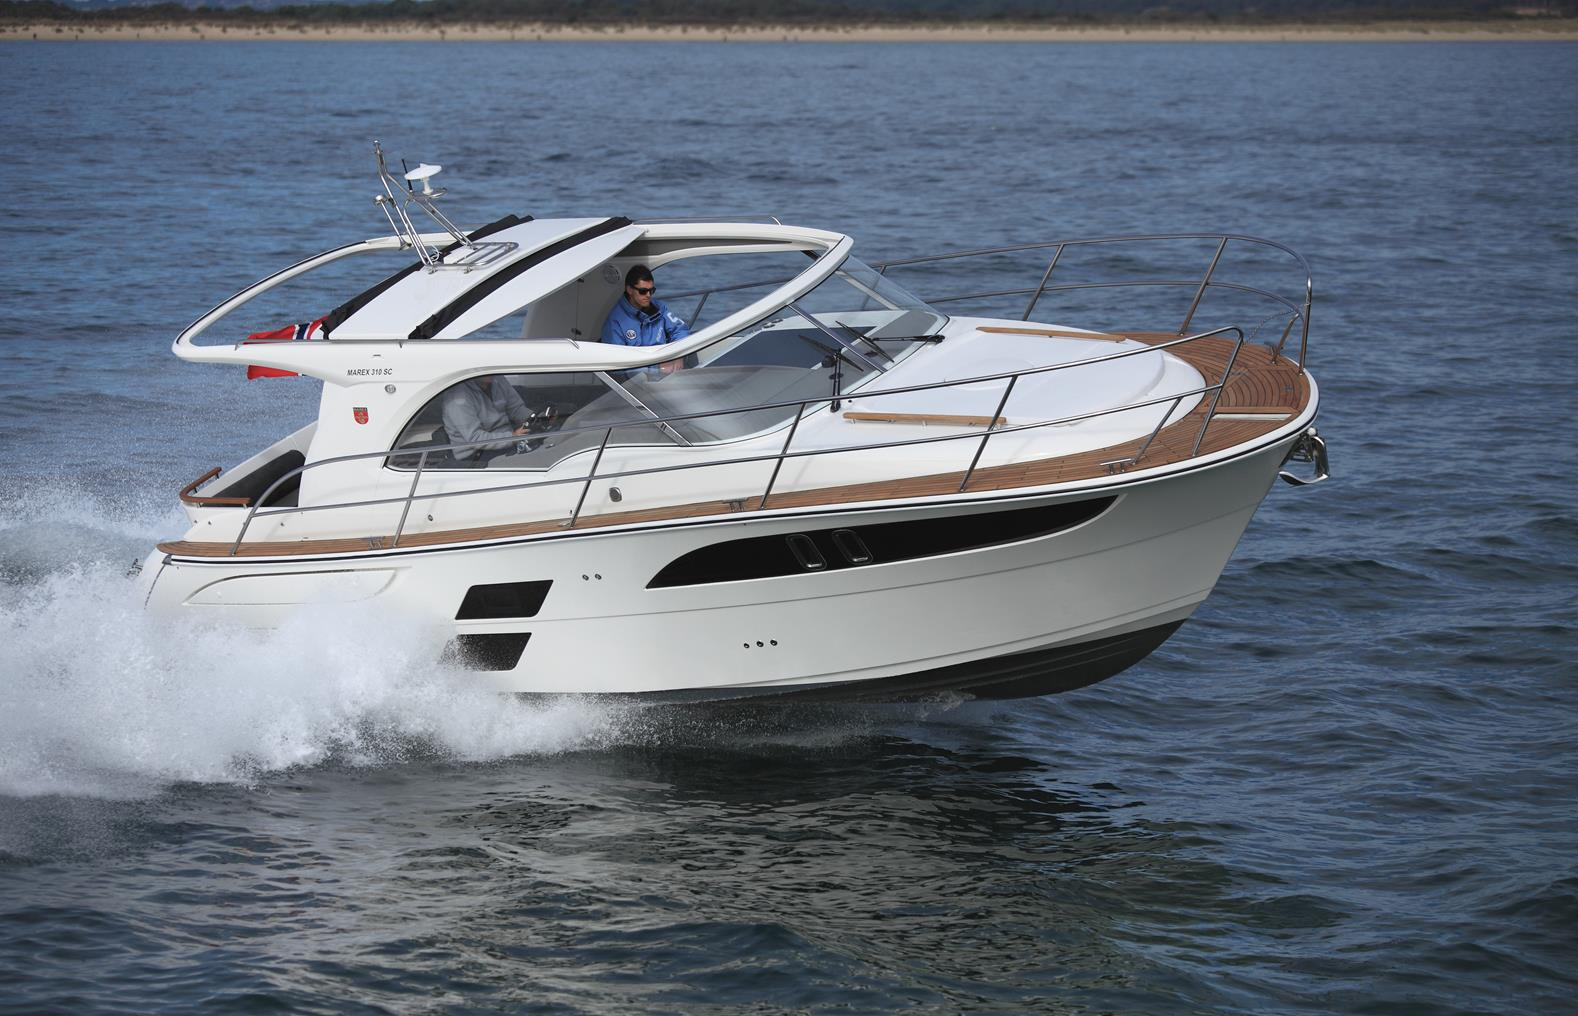 Marex 310 Boat